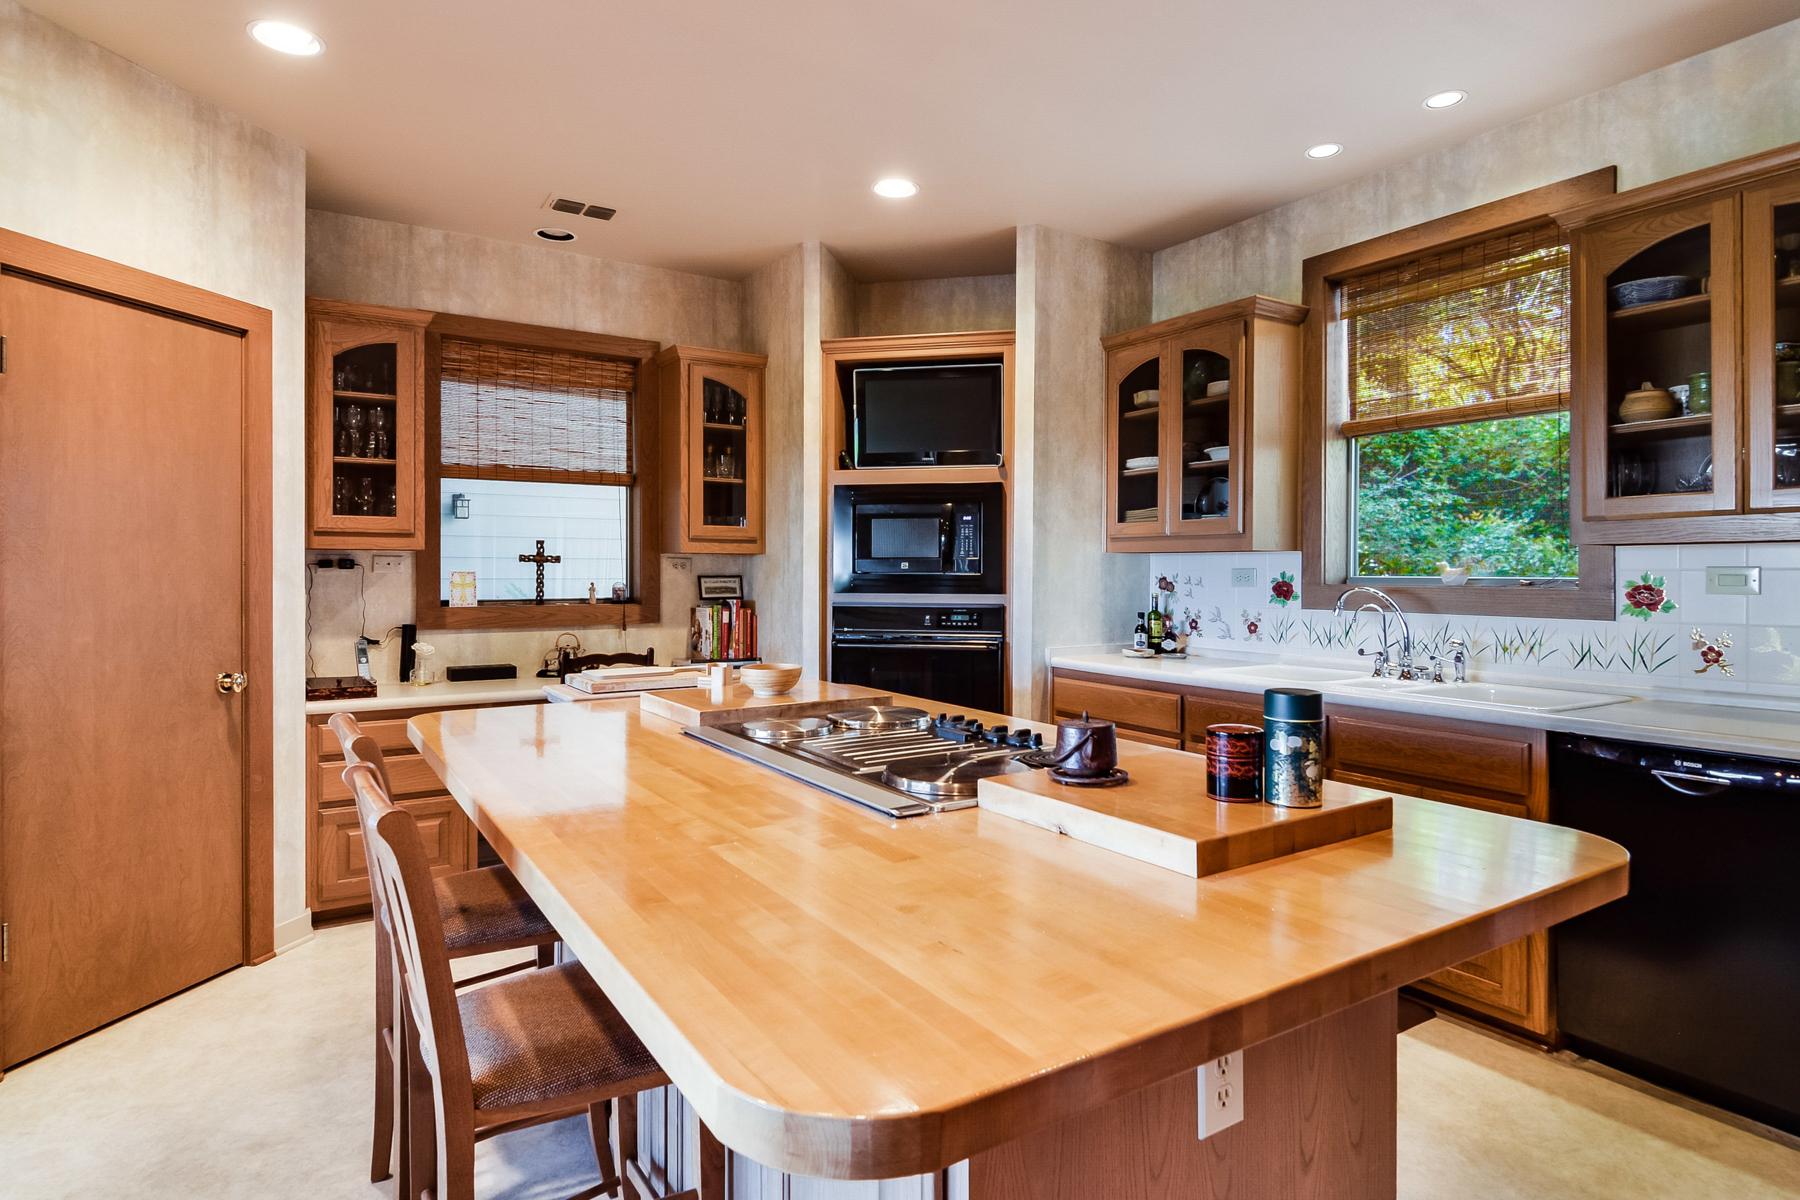 Additional photo for property listing at Custom Home in Boerne! 26714 Karsch Rd Boerne, Texas 78006 Estados Unidos